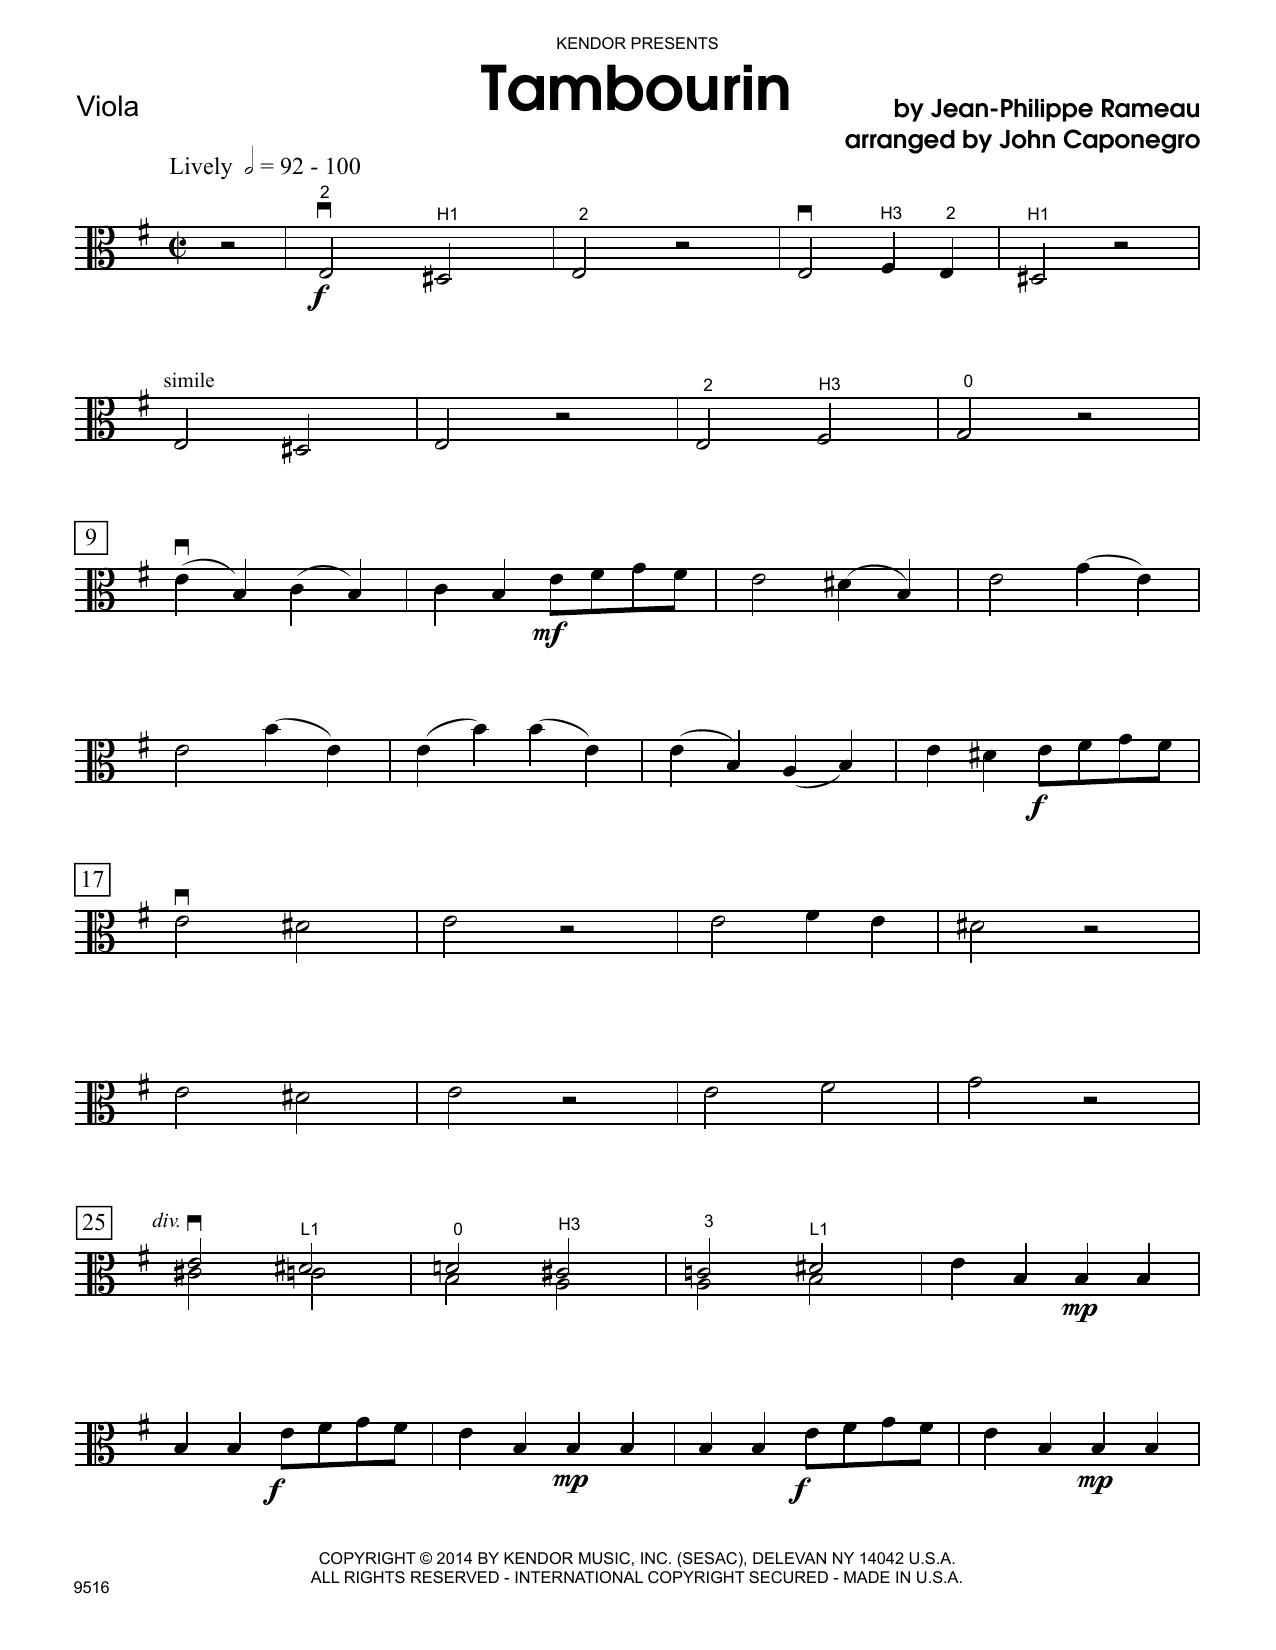 Tambourin - Viola